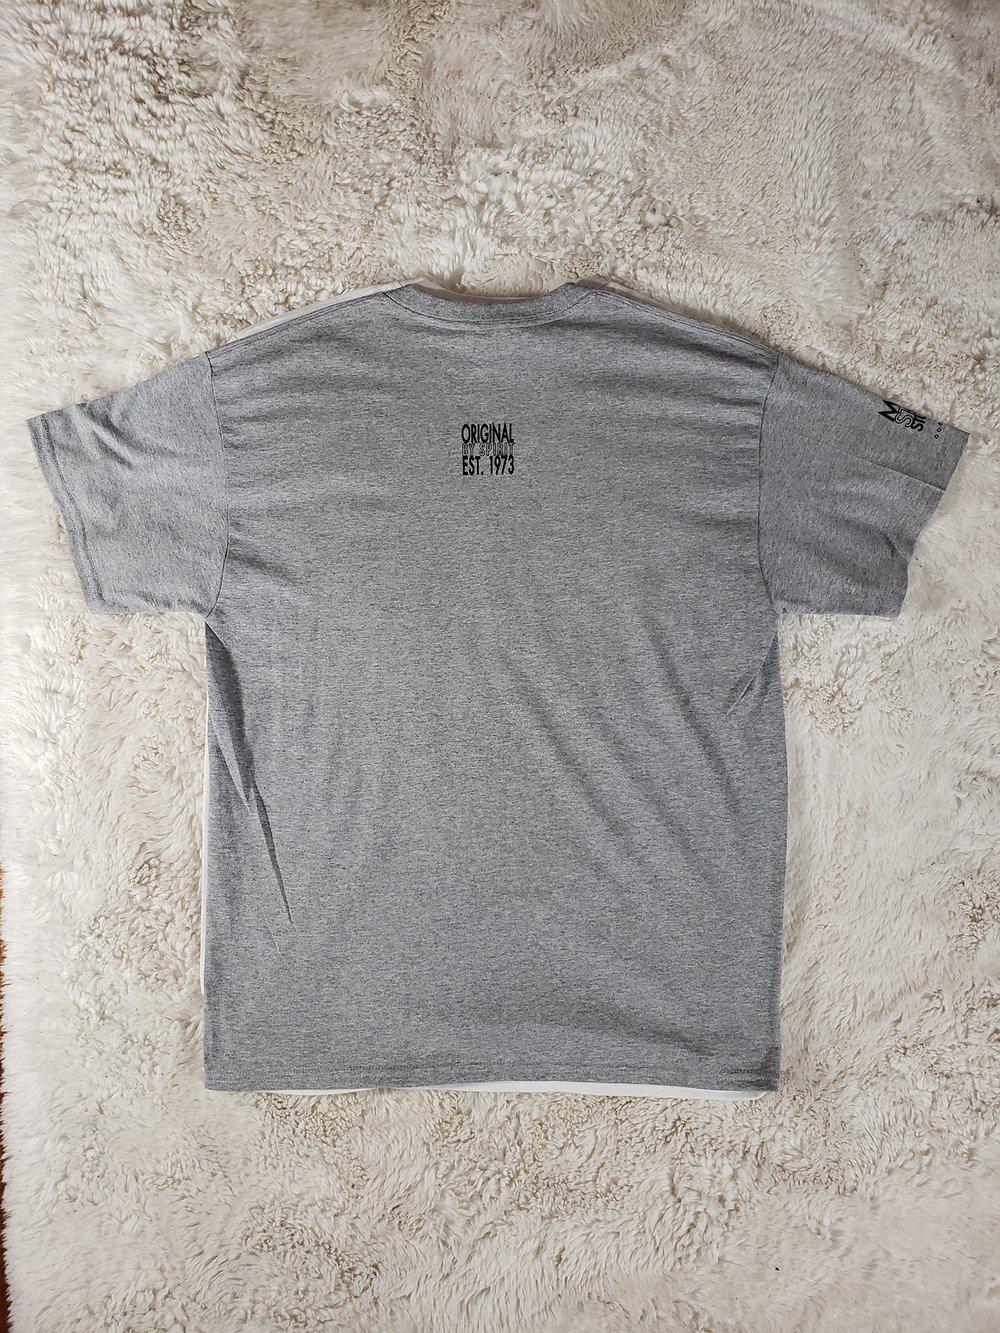 Image of We See Wee Pocket-Size